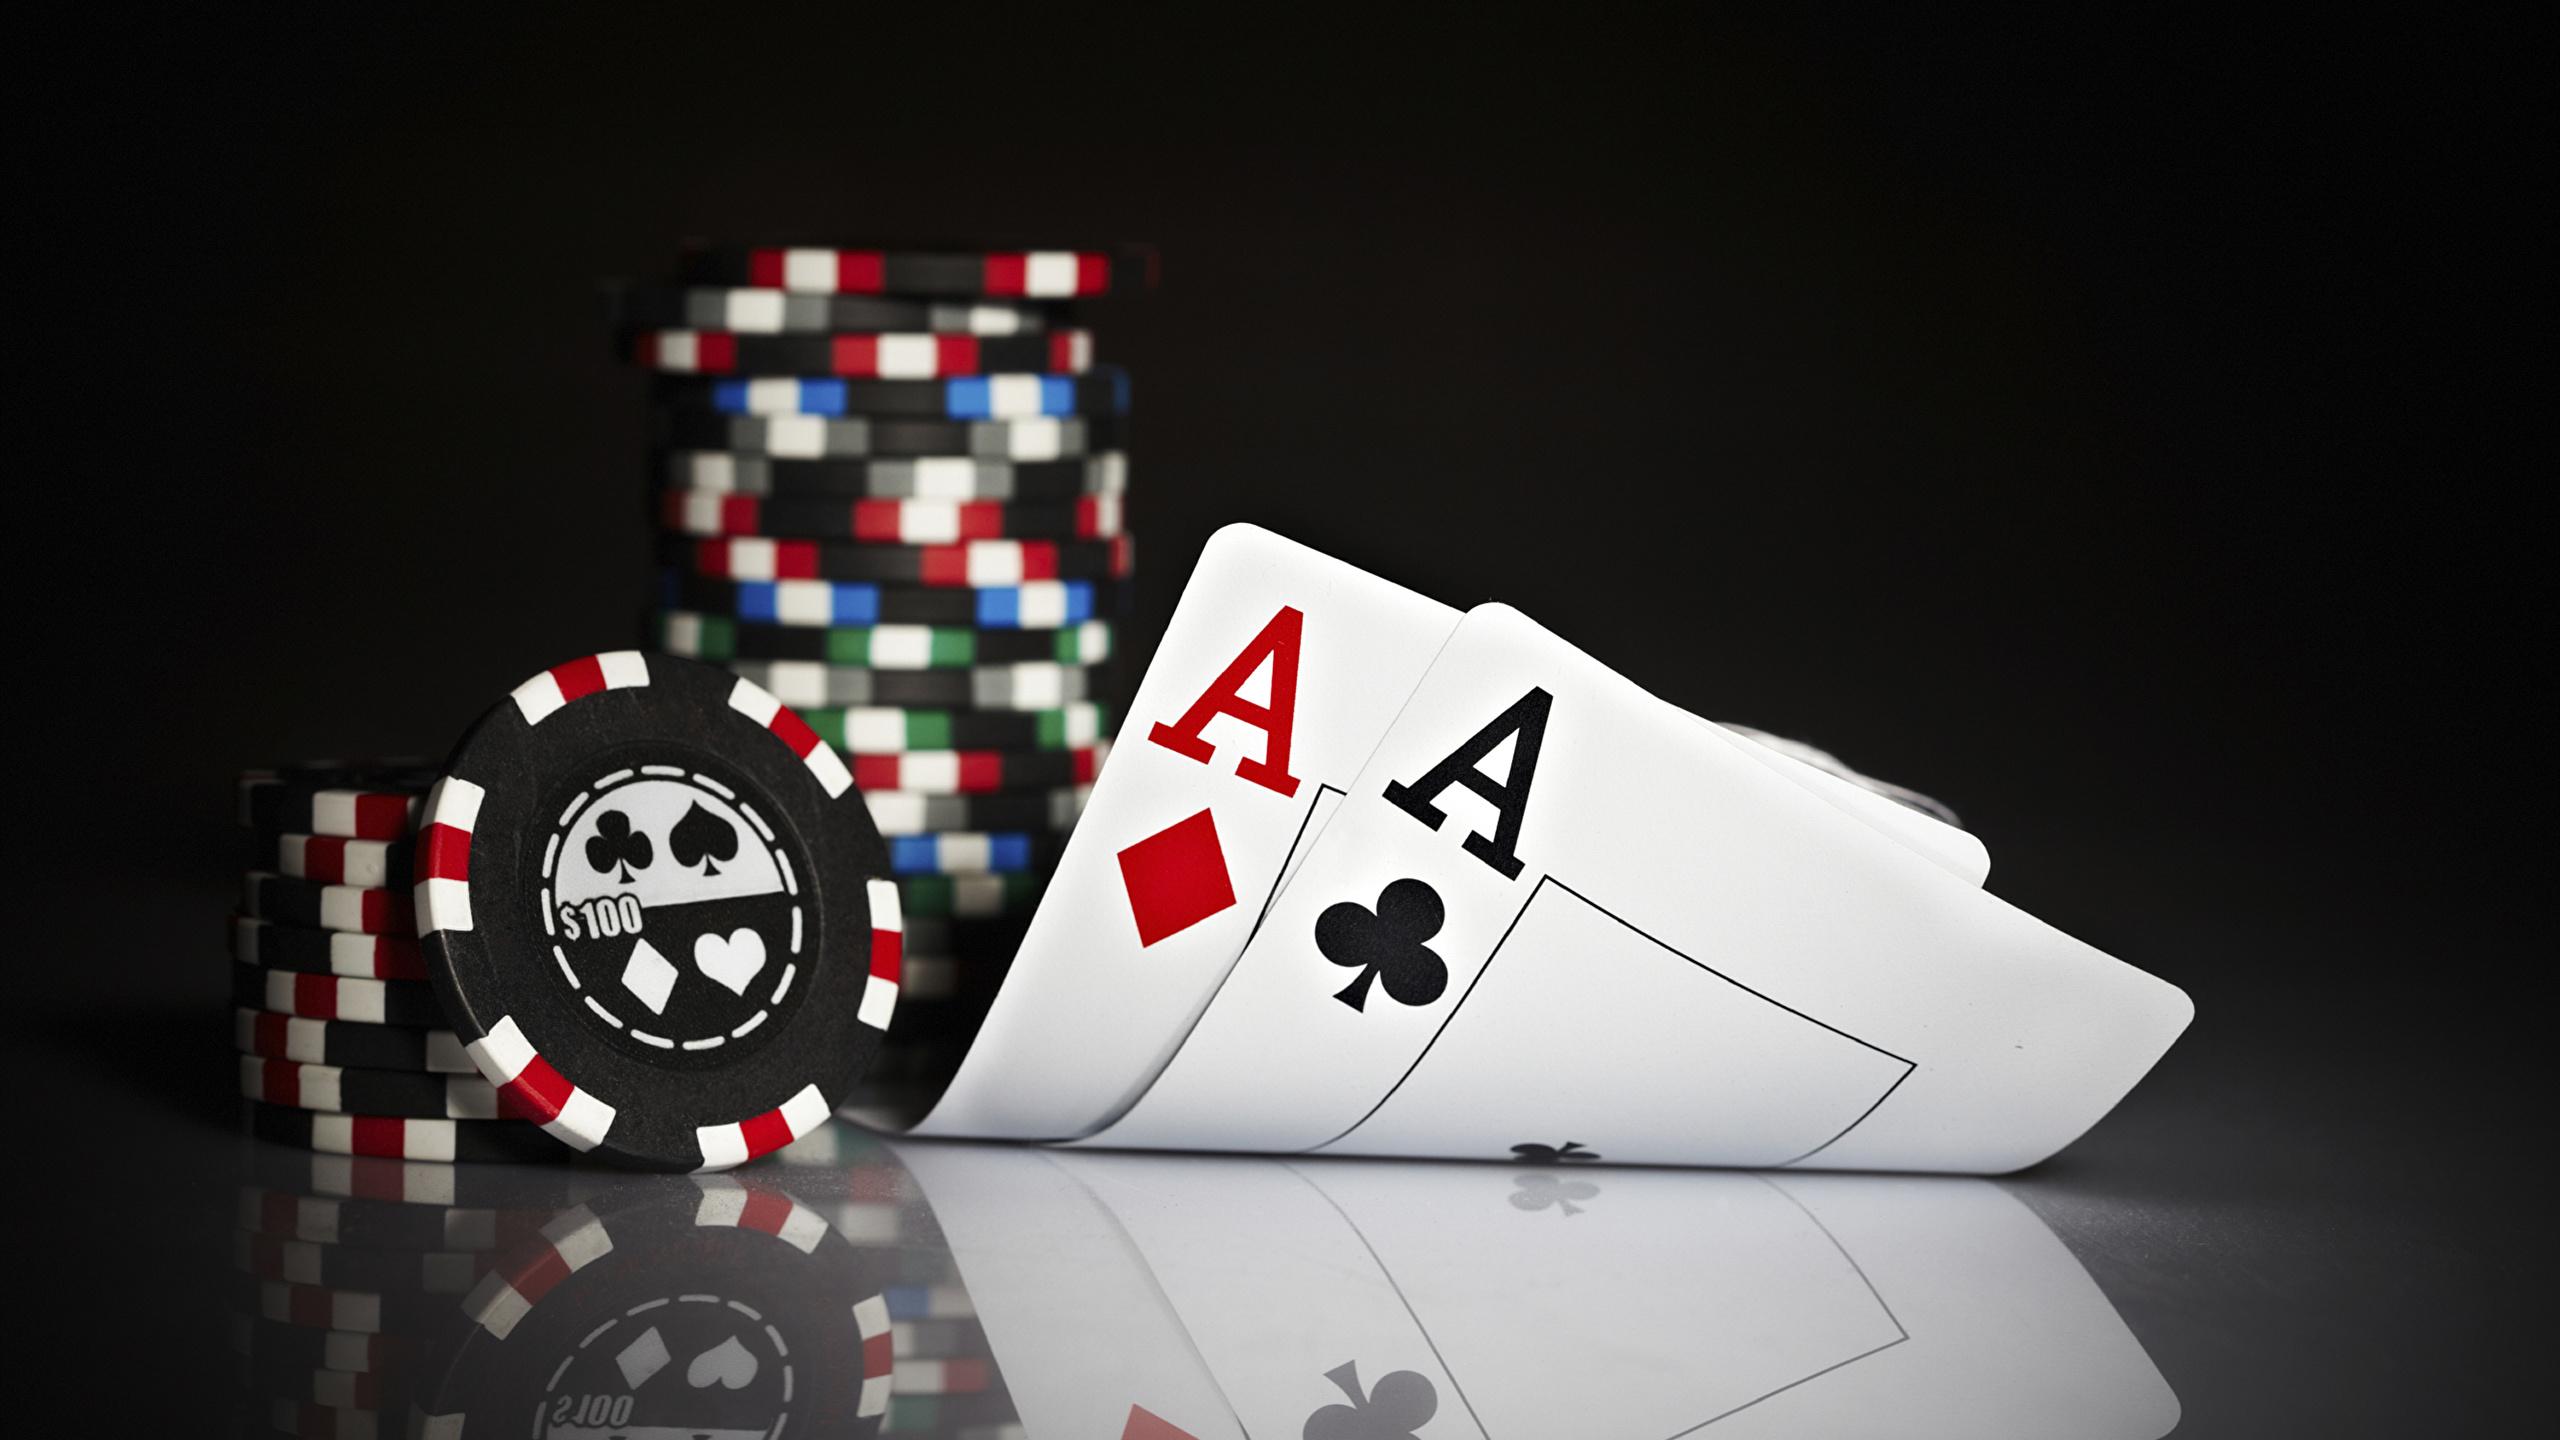 Photo Poker Playing Cards Closeup 2560x1440